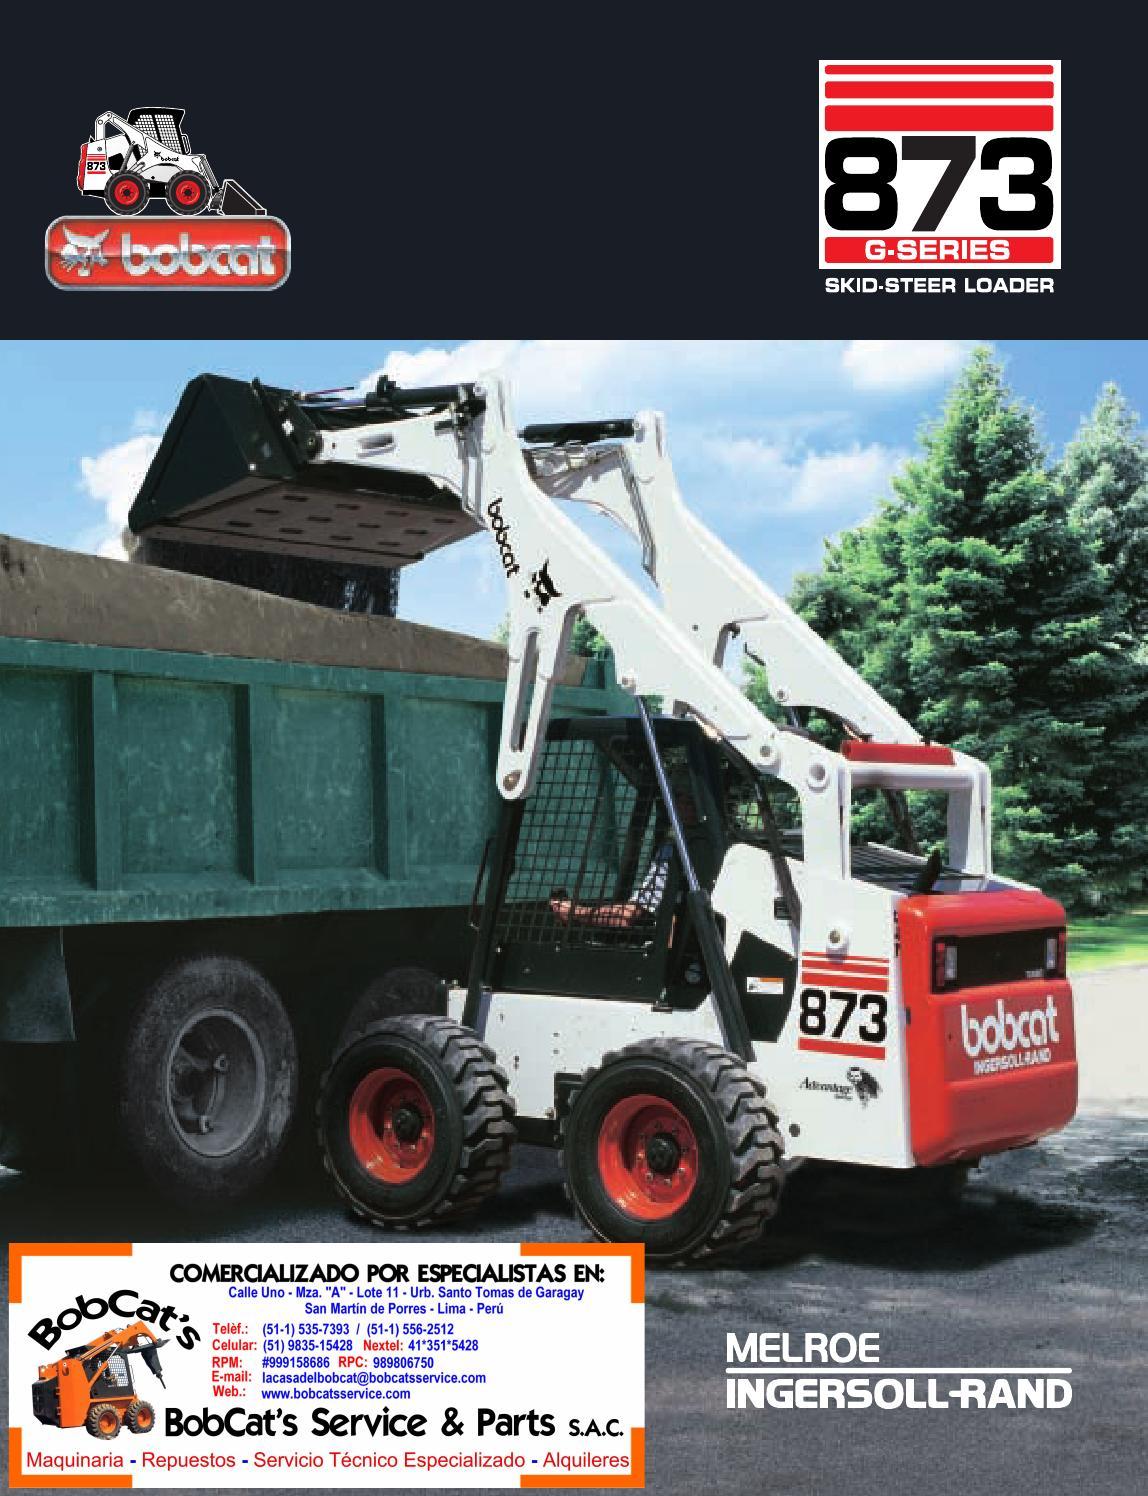 873 bobcat engine - 873 Bobcat Engine 50